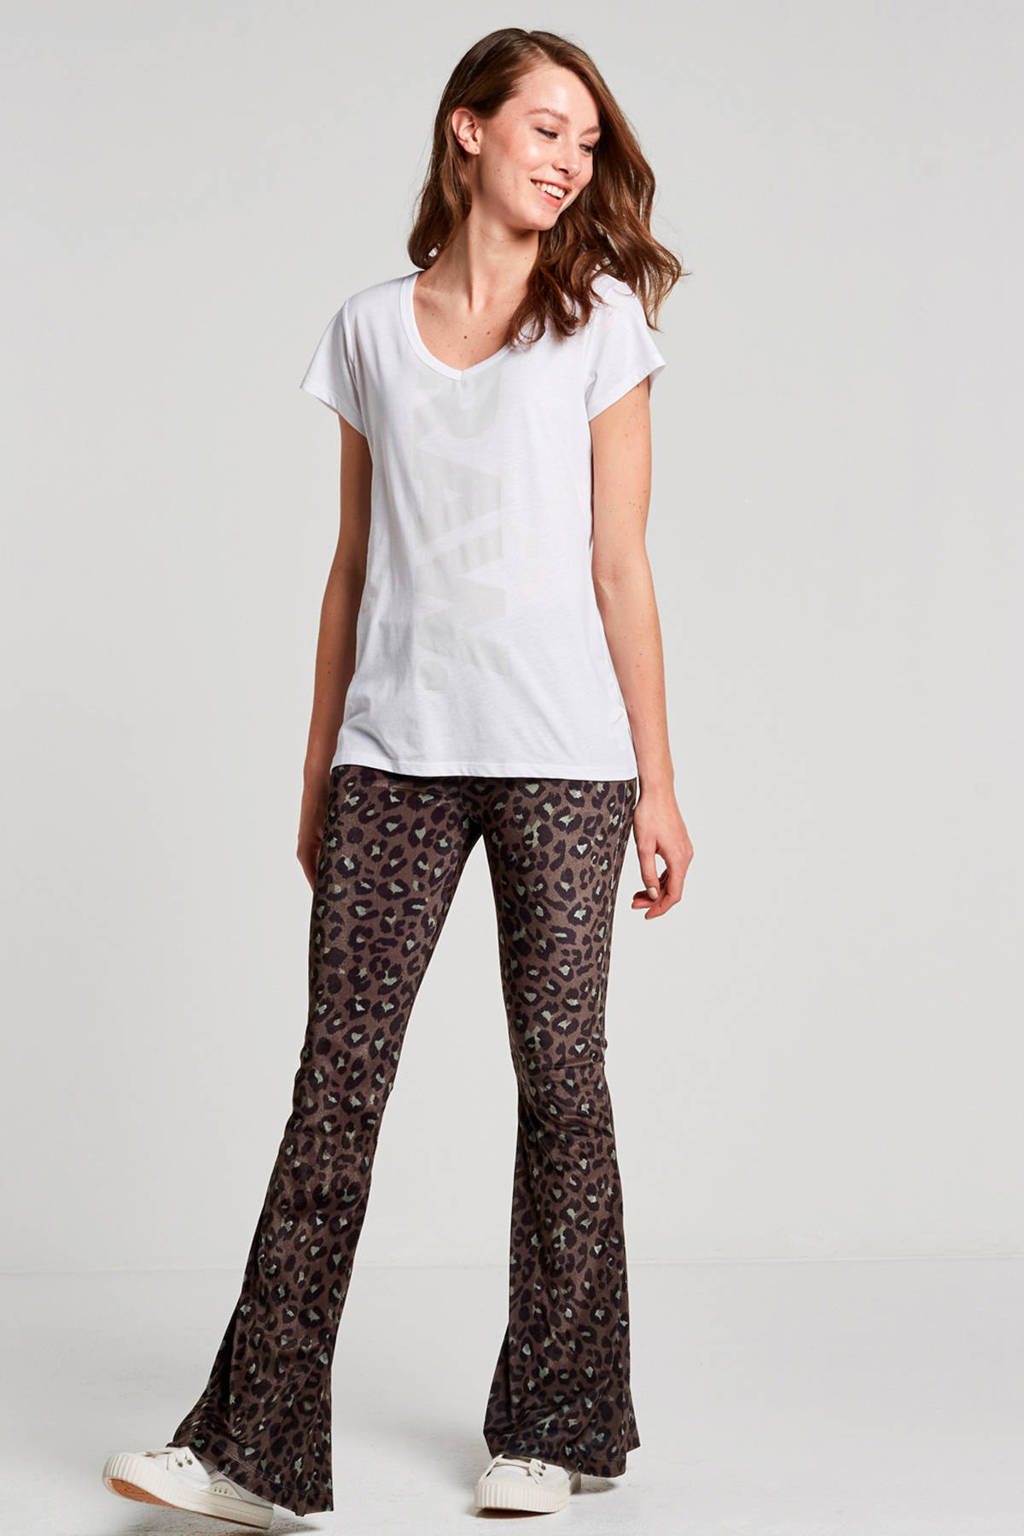 Catwalk Junkie Cheetah Woodstock fluwelen flared broek, Groen/zwart